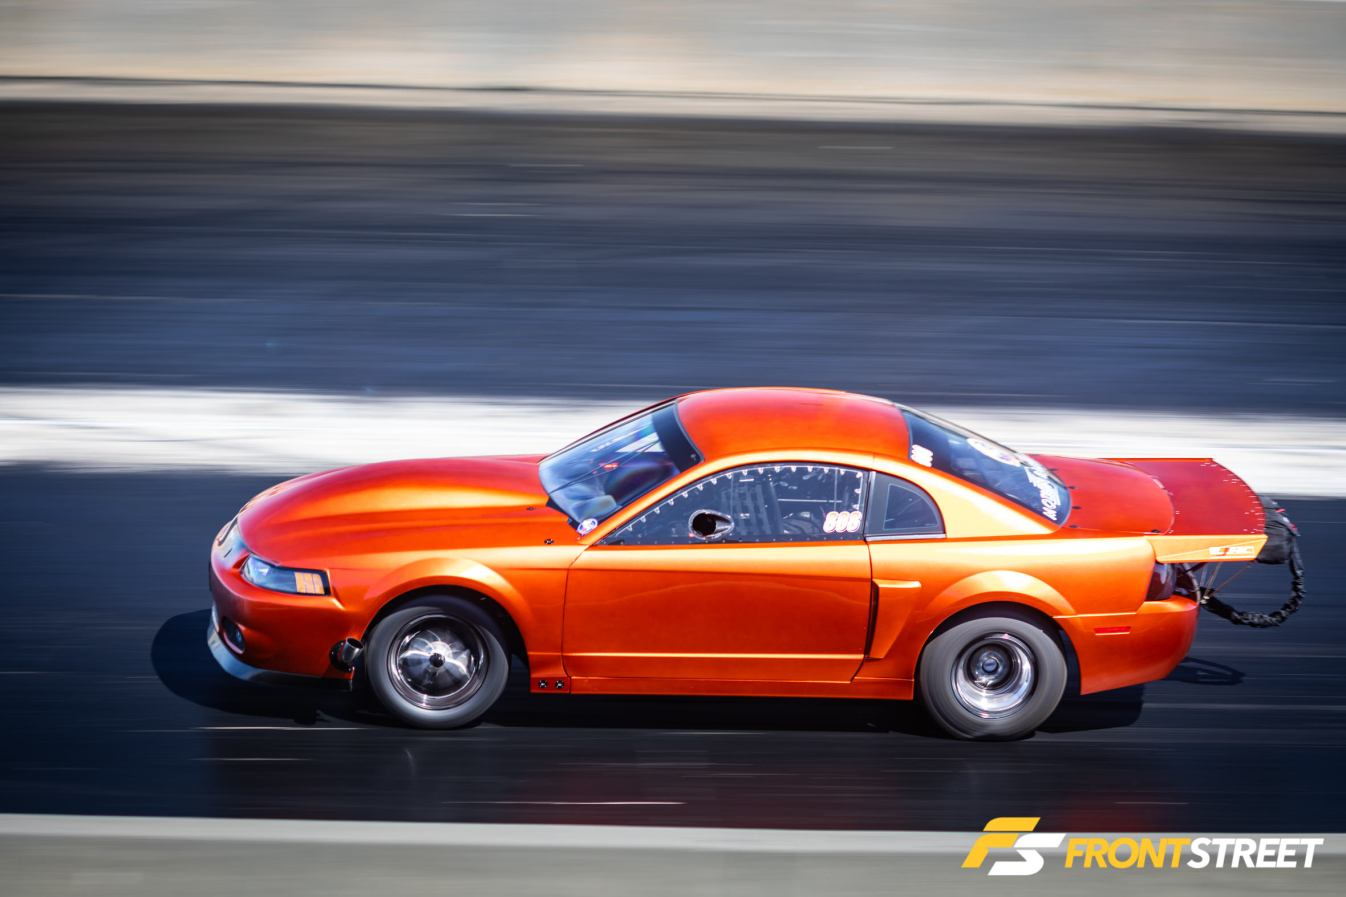 Fulfilling Desires: Justin Cyrnek's Tangerine Dream '04 X275 Cobra